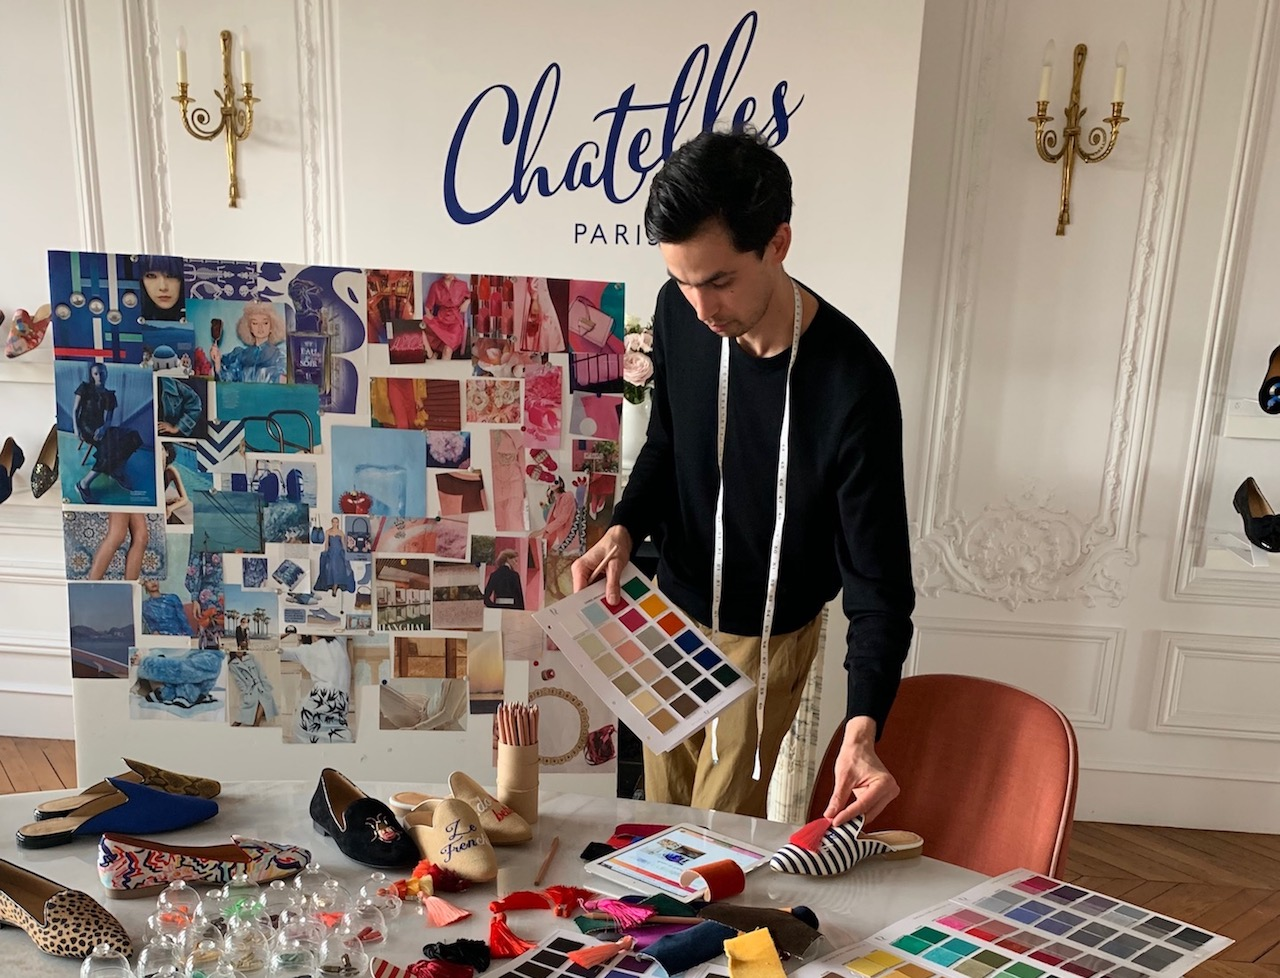 「Chatelles(シャテル)」のデザイナーフランソワ・ドゥ・シャステル氏